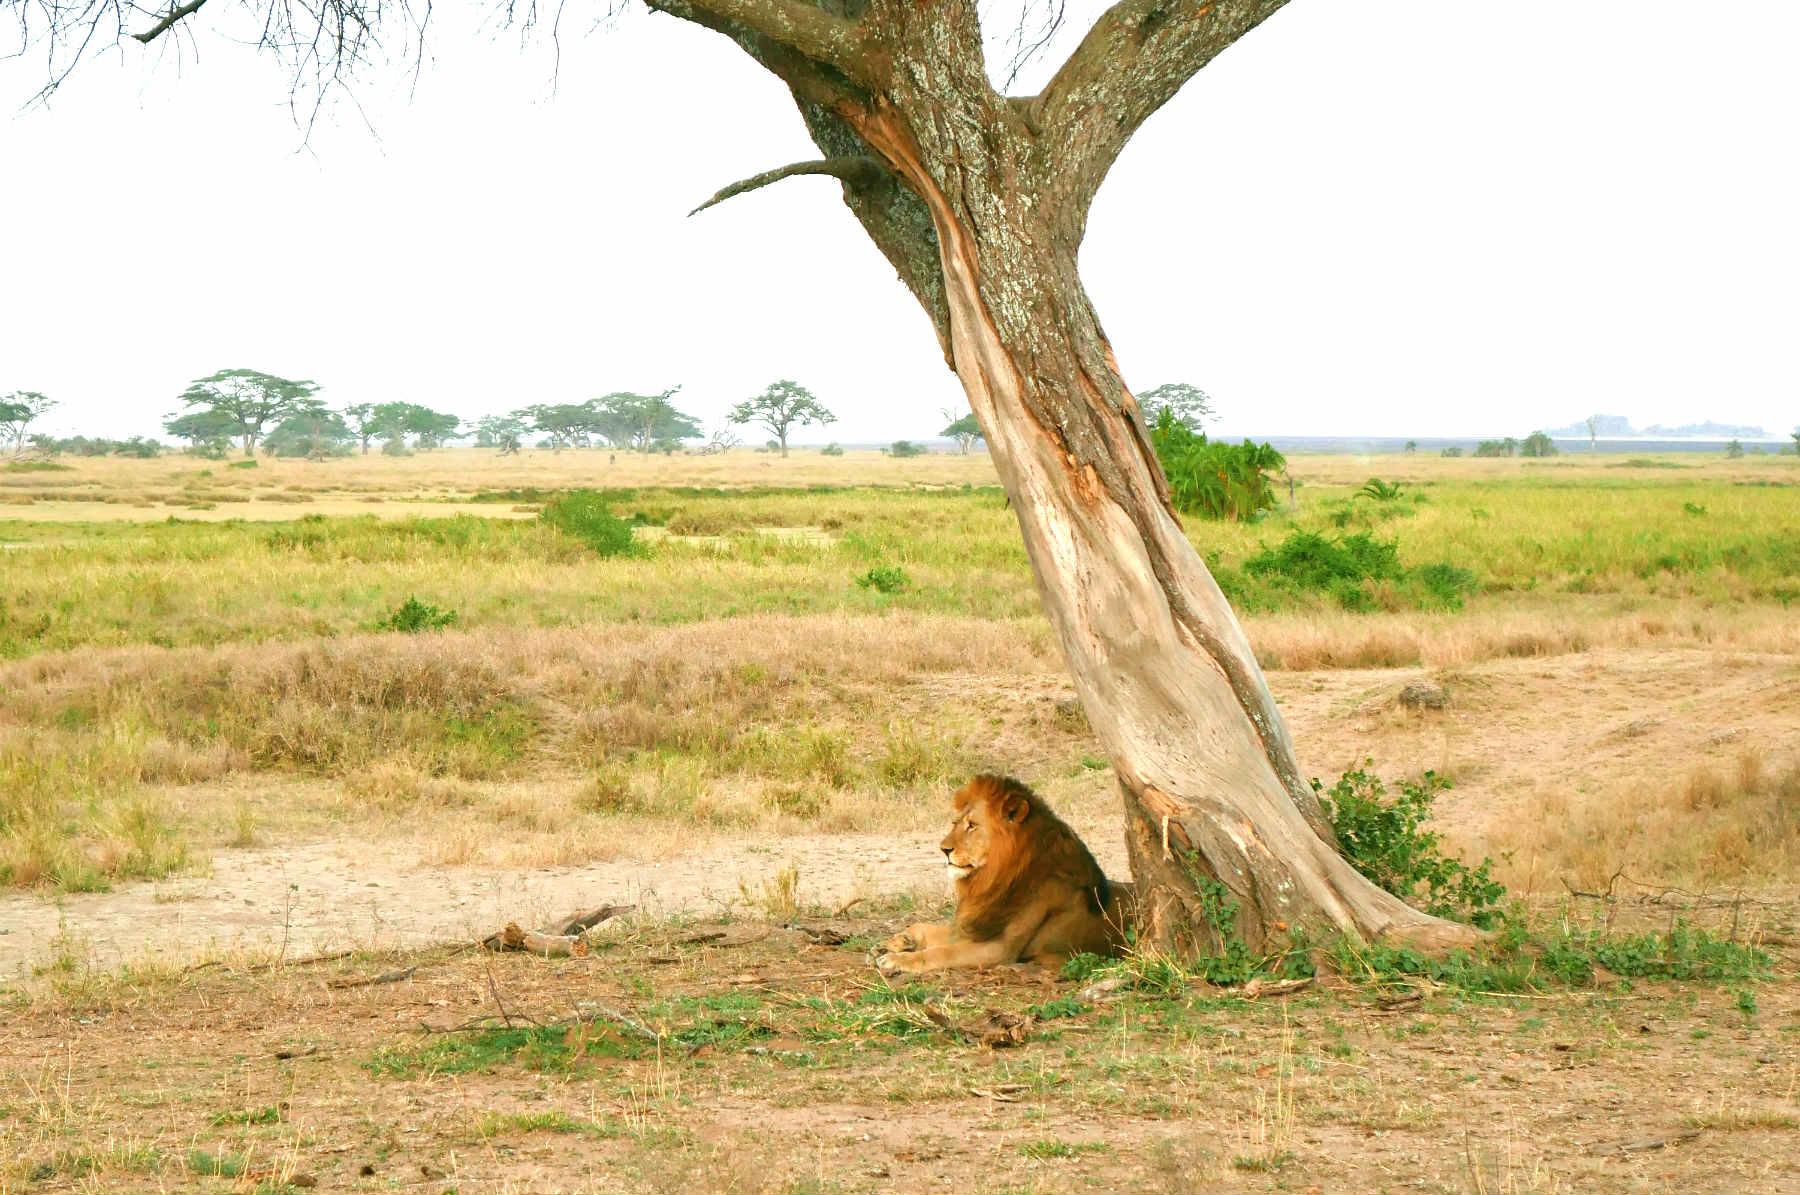 How To Plan A Tanzania Safari On A Budget